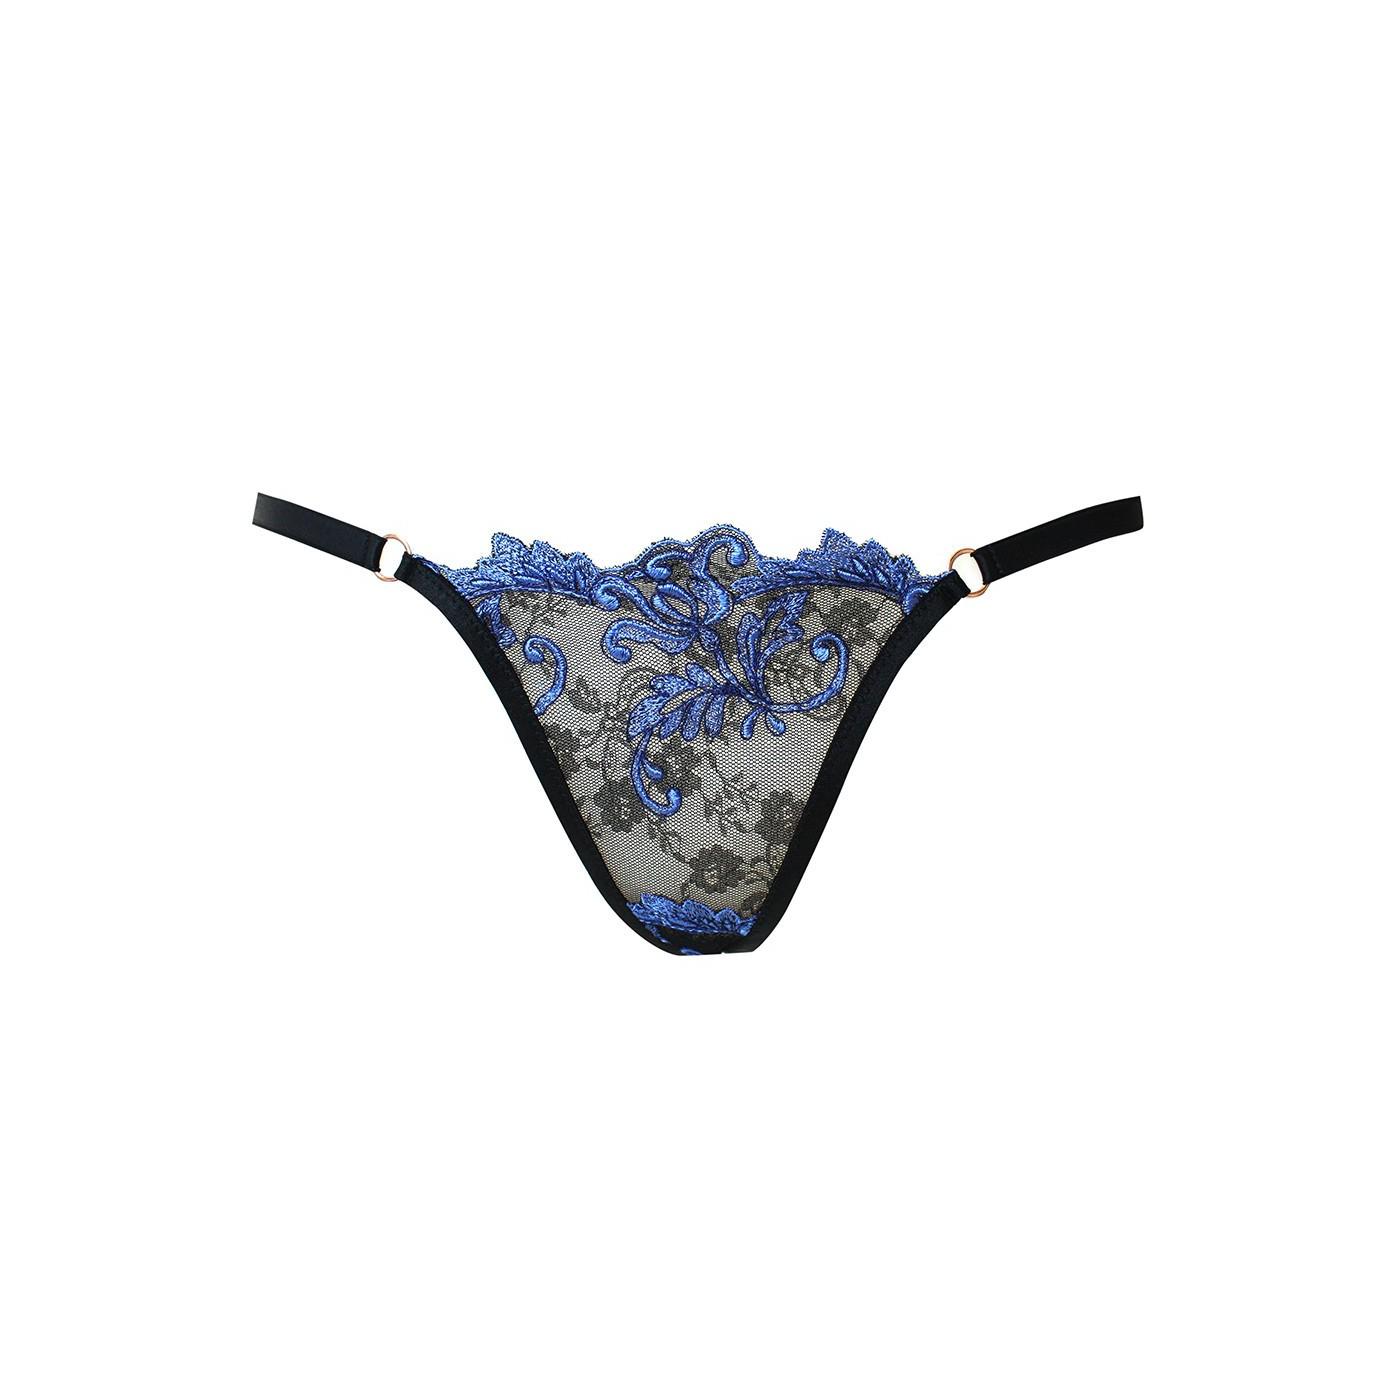 Lagon String - Luxury Lingerie – Impudique Official Website